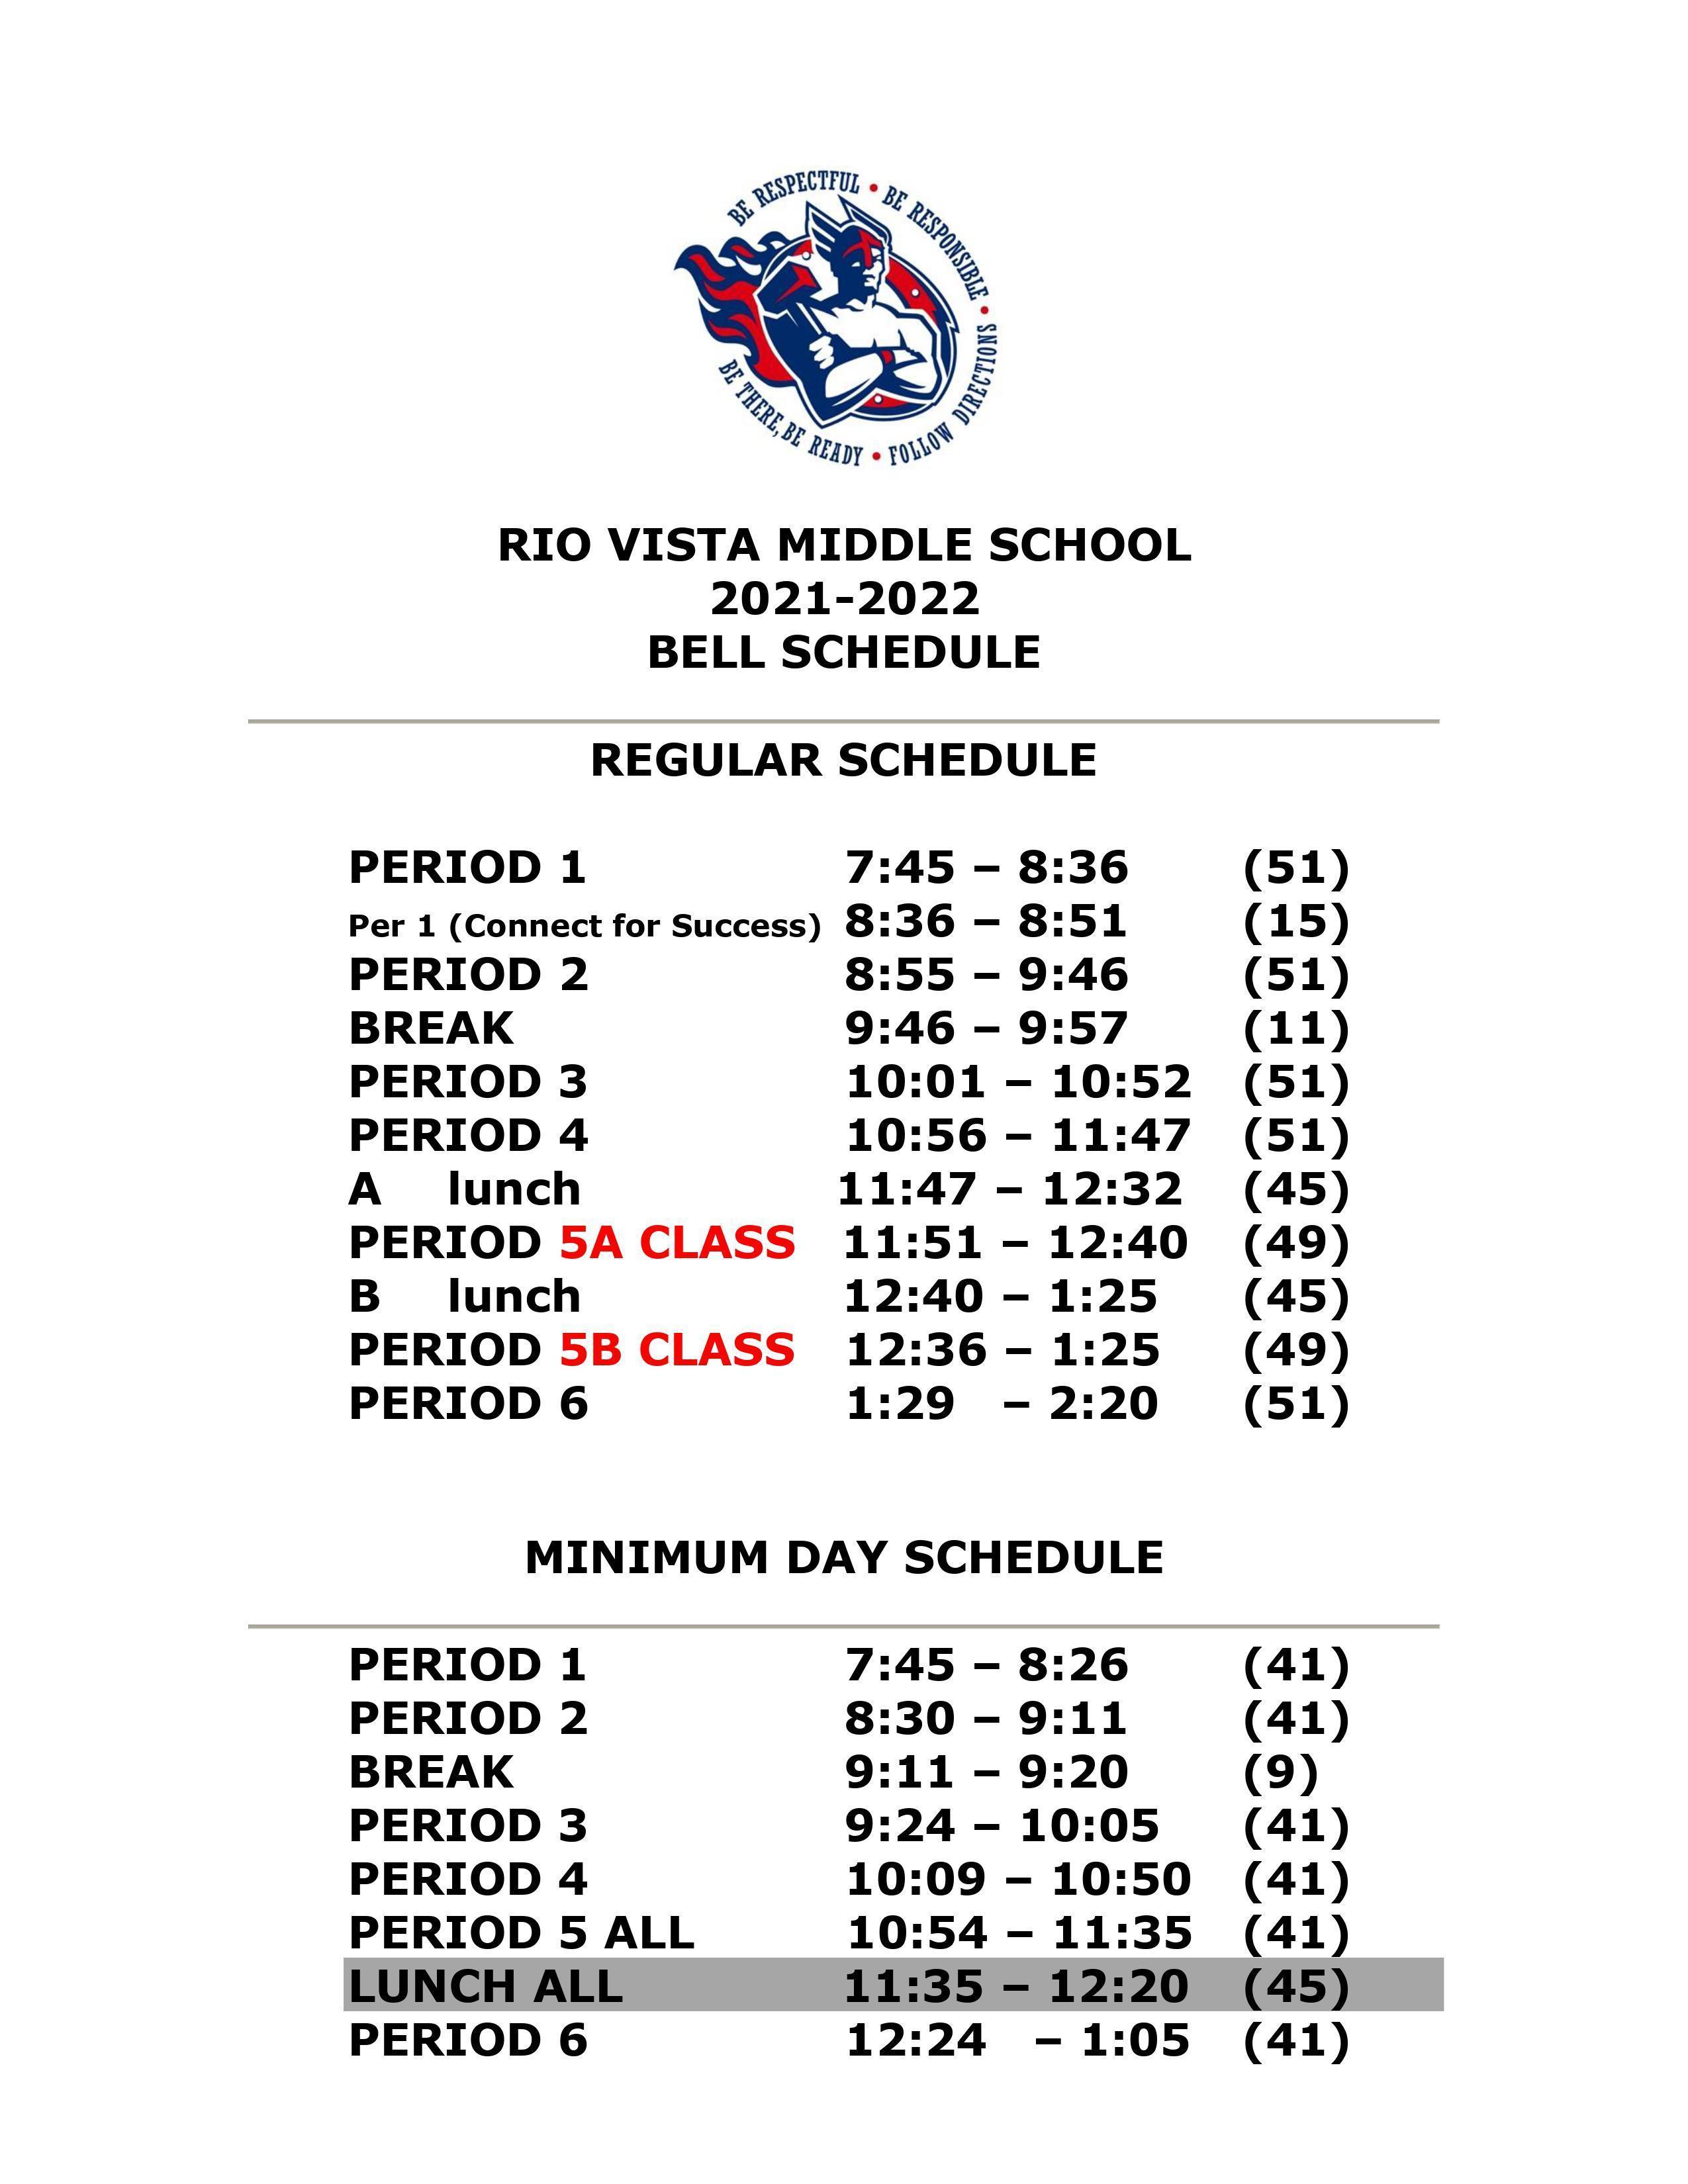 Bell Schedule for 21-22 School Year